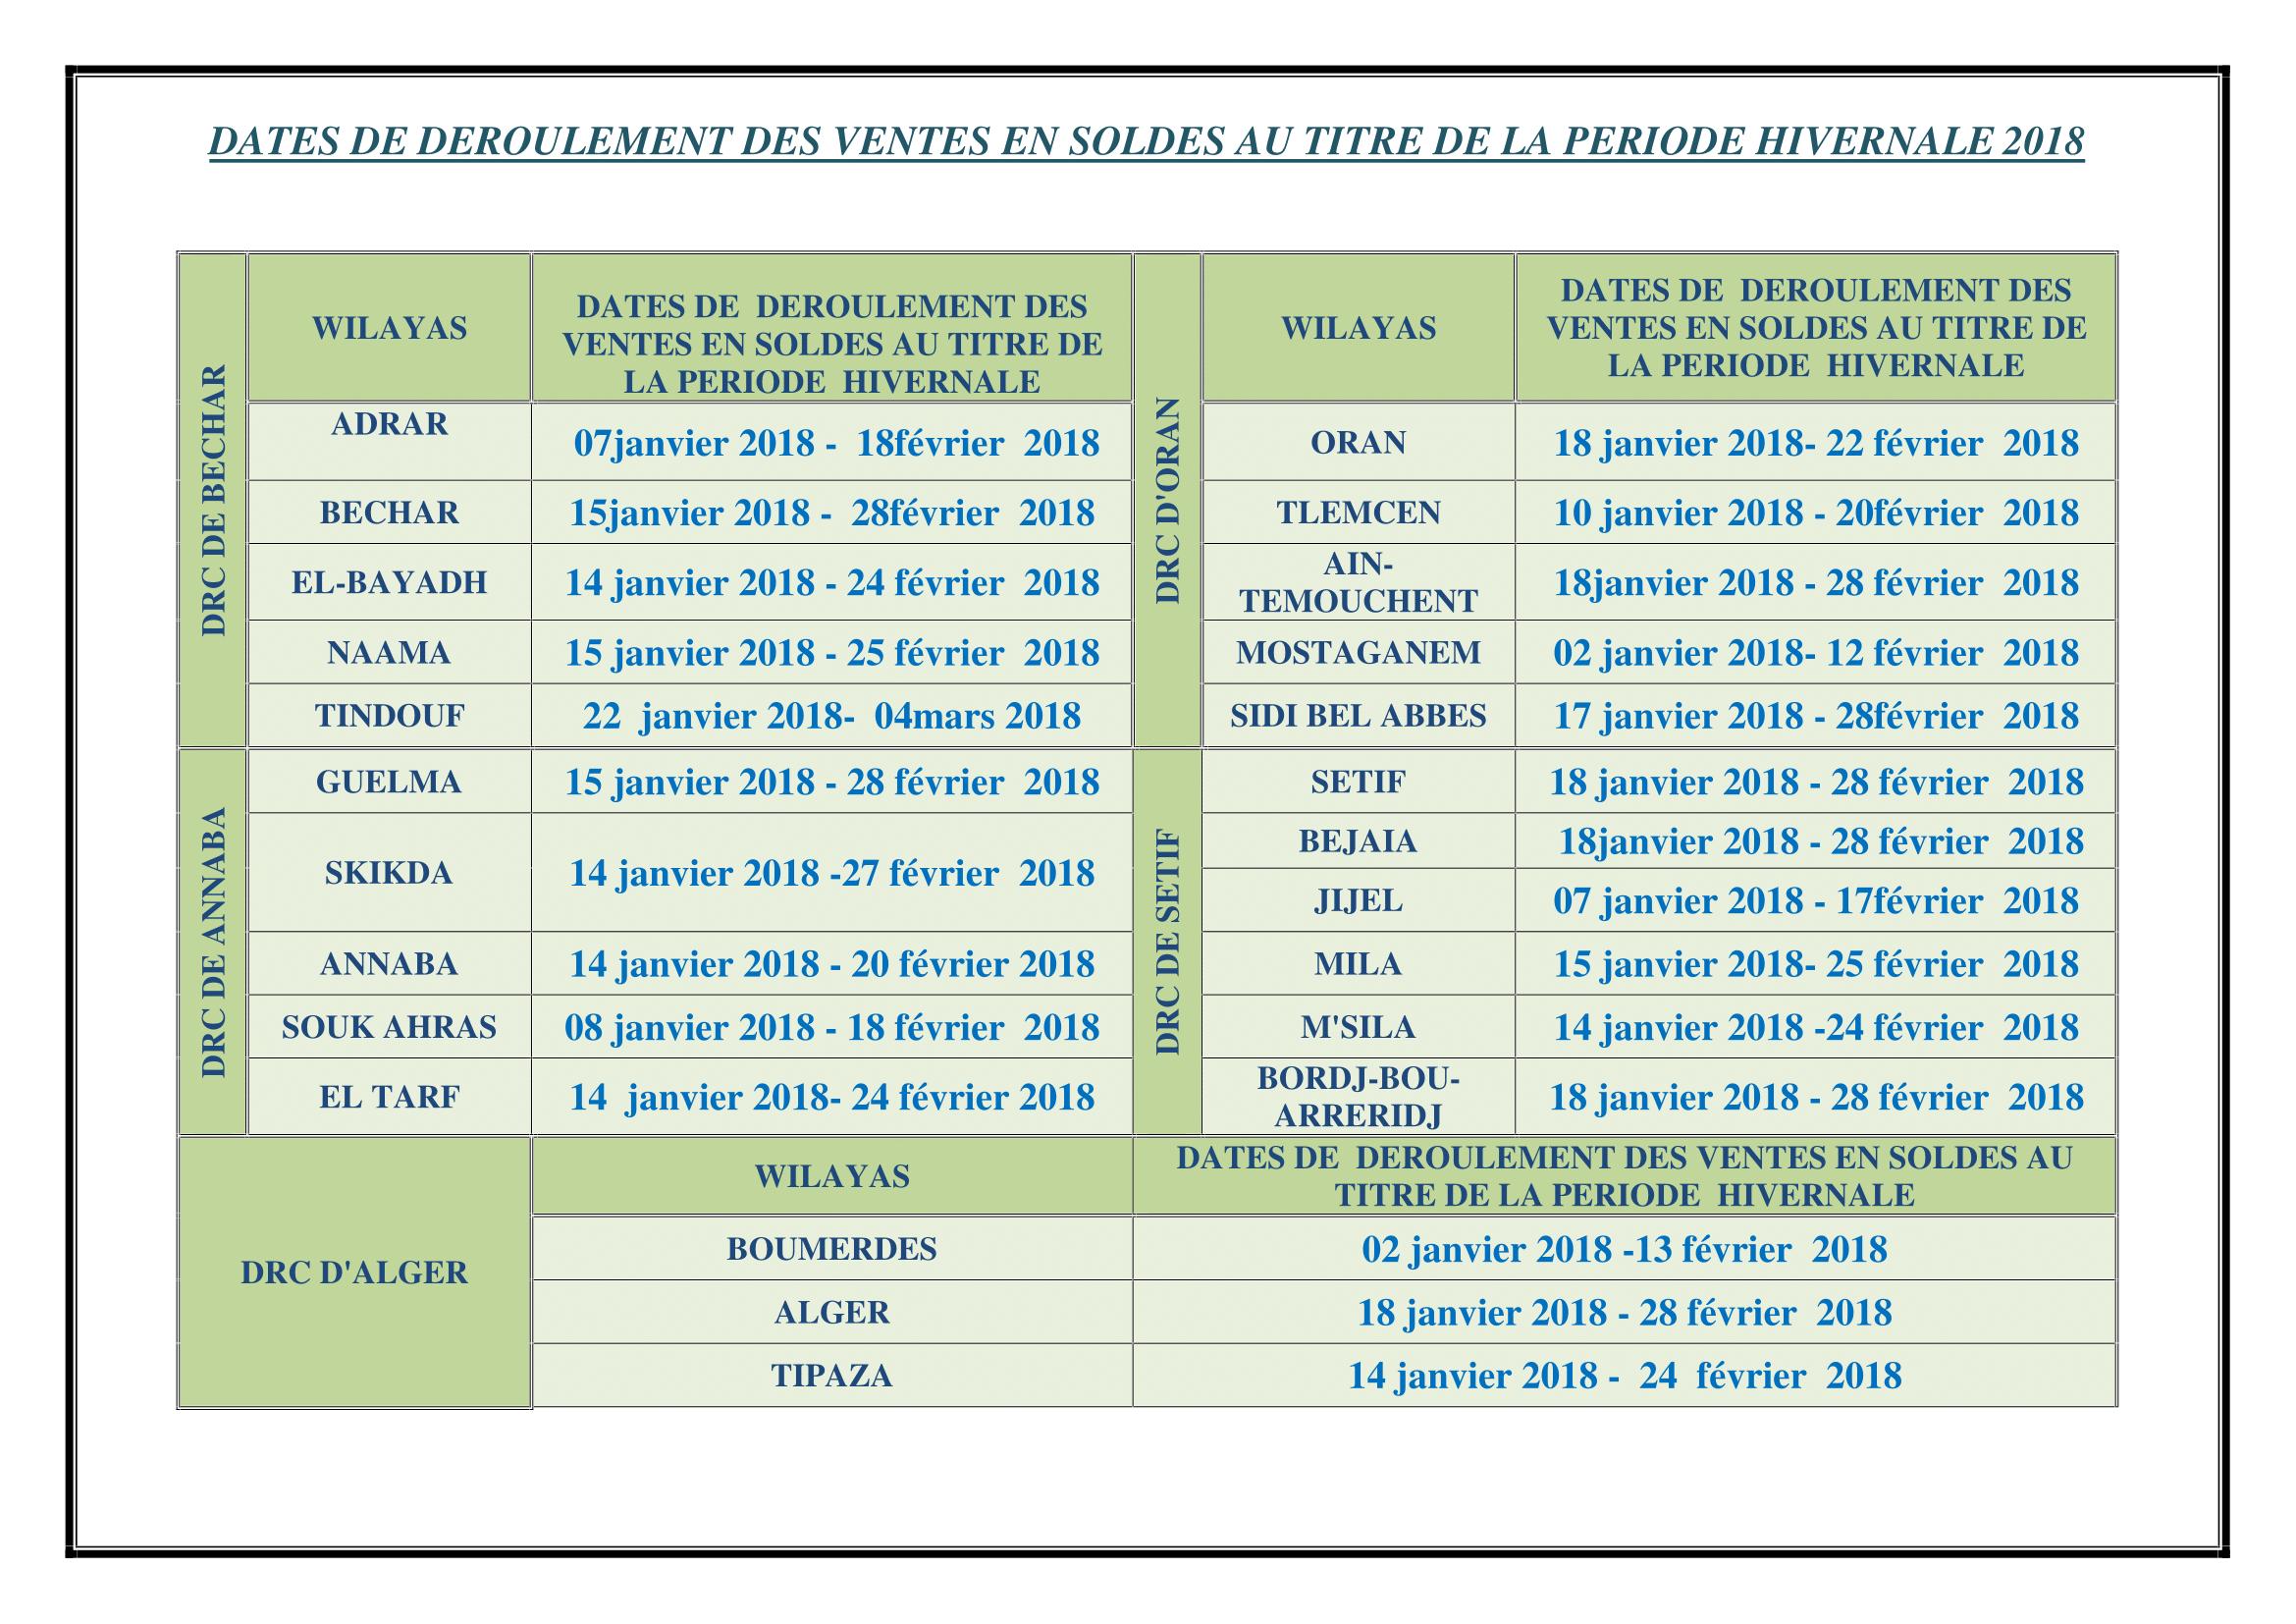 Soldes d 39 hiver les dates par wilaya fix es tsa - Date fin de soldes ...